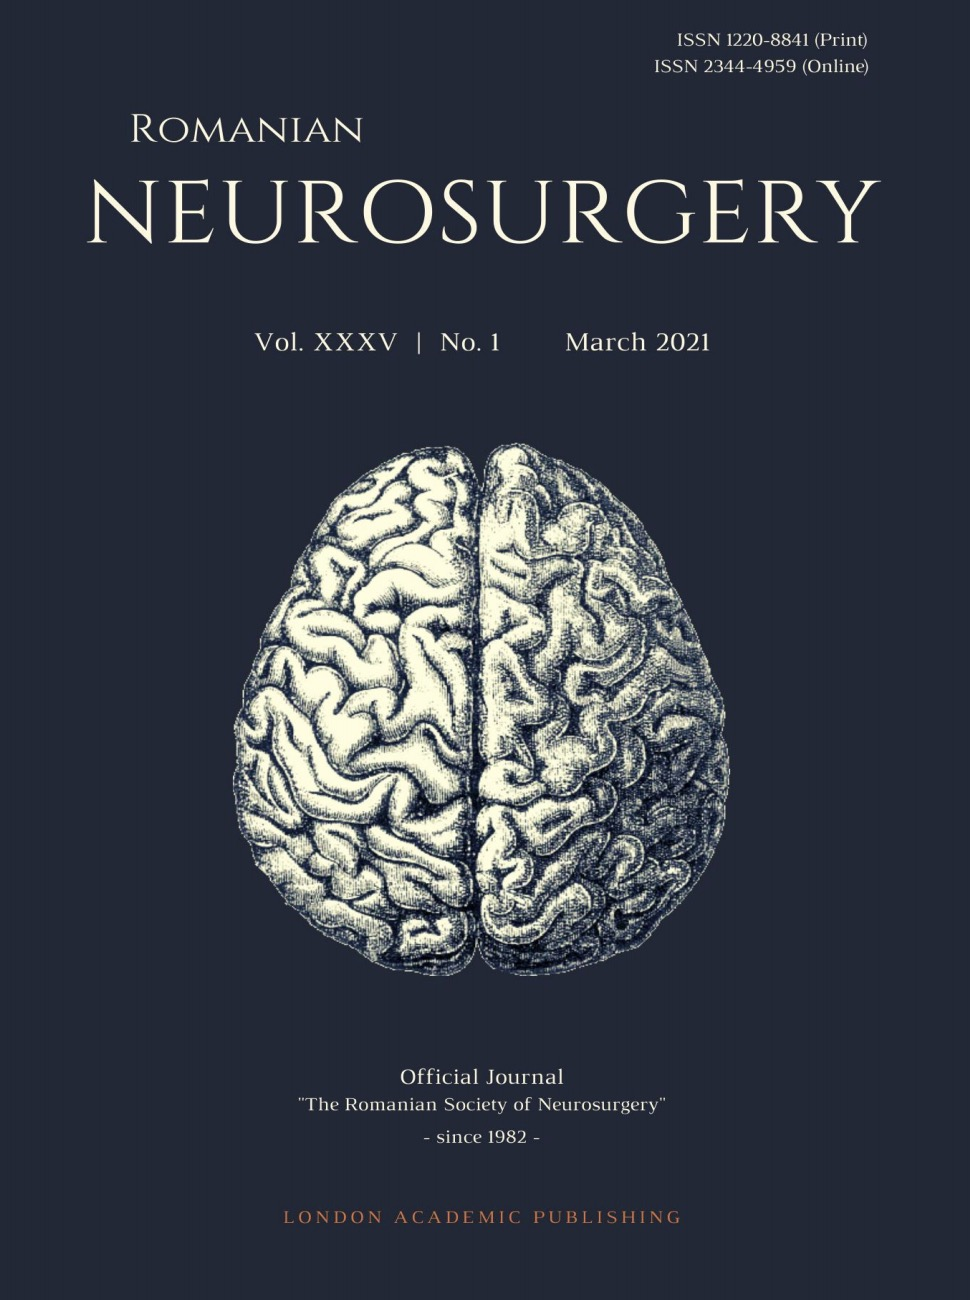 нейрохирург публикам в журнале